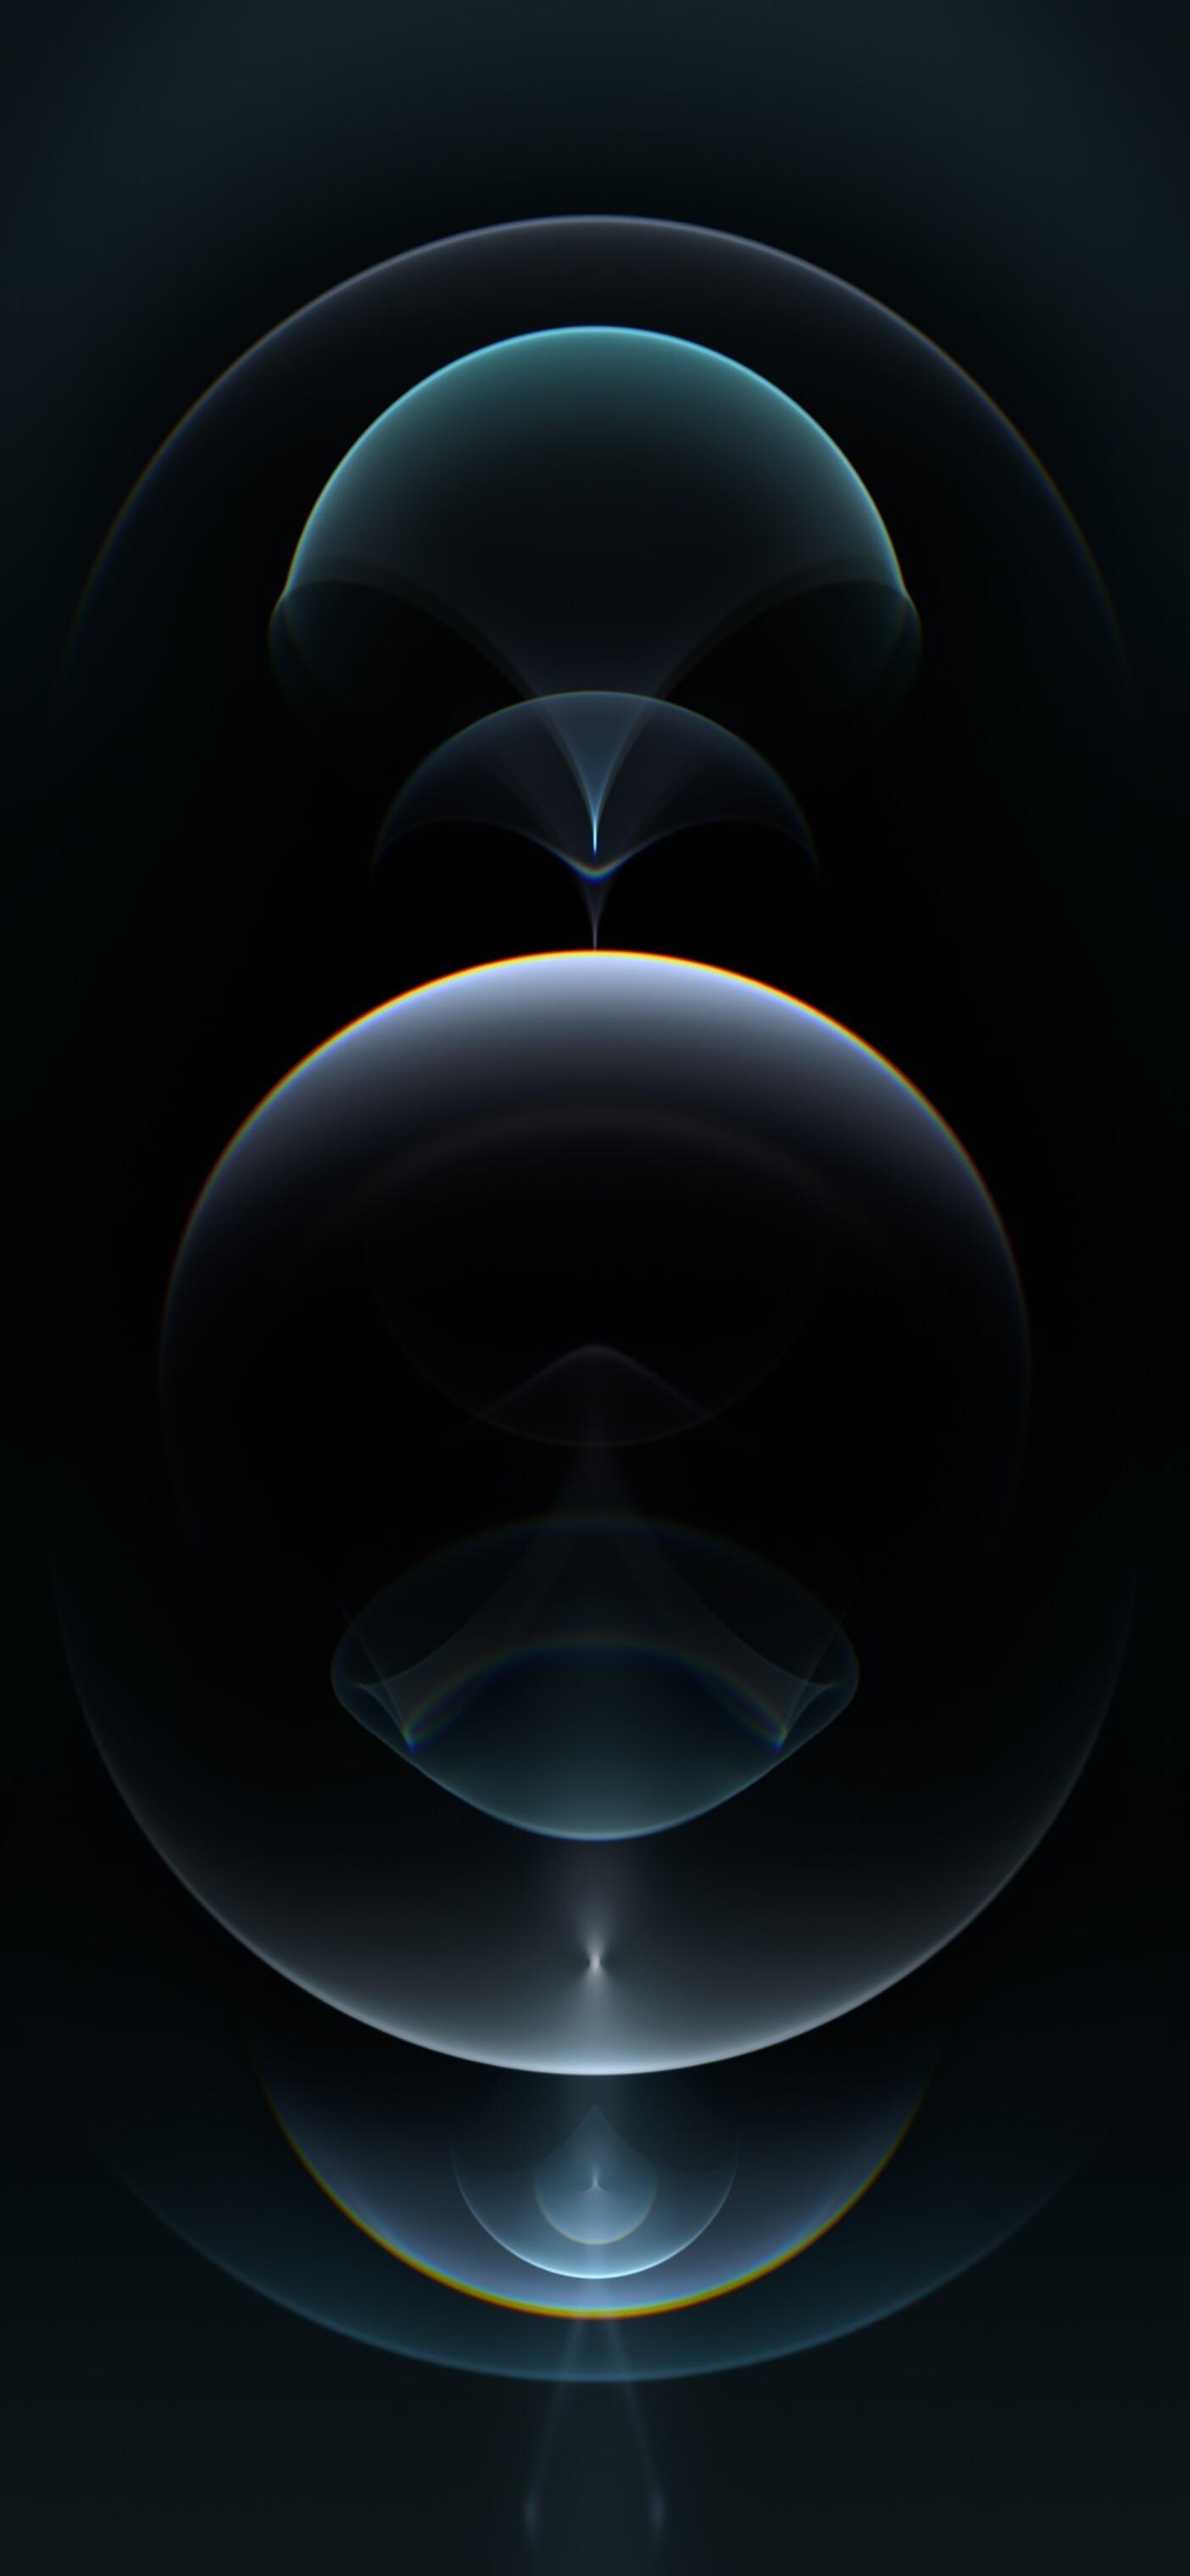 Les Fonds D Ecran Officiels Des Iphone 12 Pro D Apple Iphone Soft